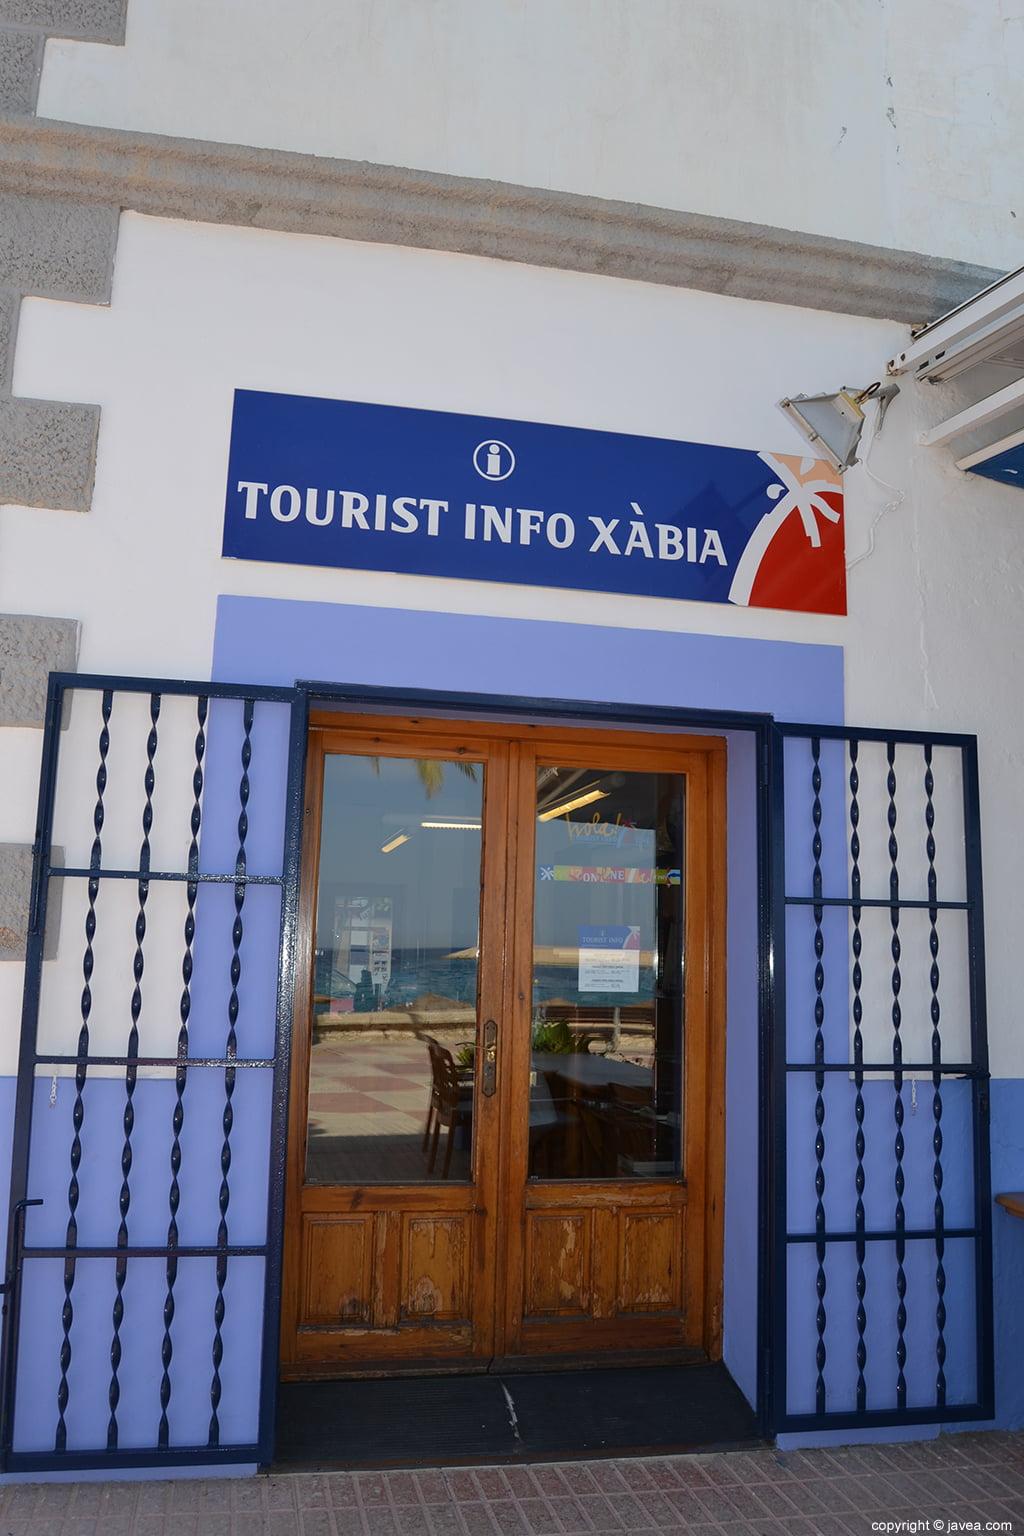 Oficina de turismo en j vea j x for Oficina de turismo lorca